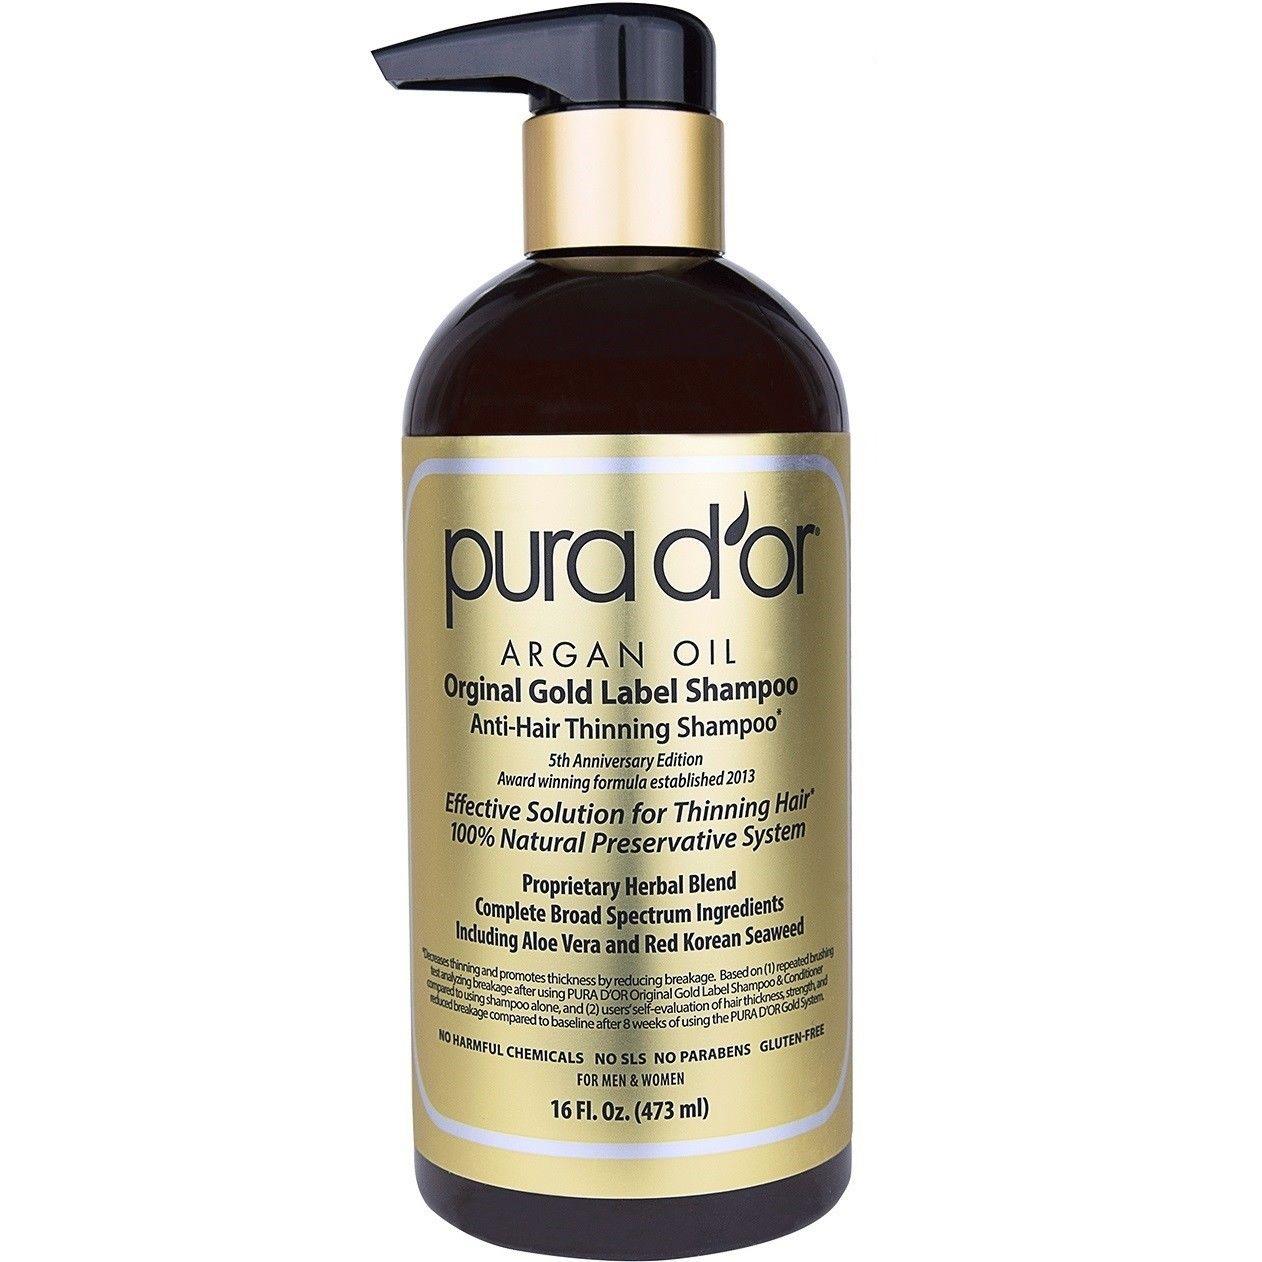 Pura D'Or Argan Oil Shampoo bottle